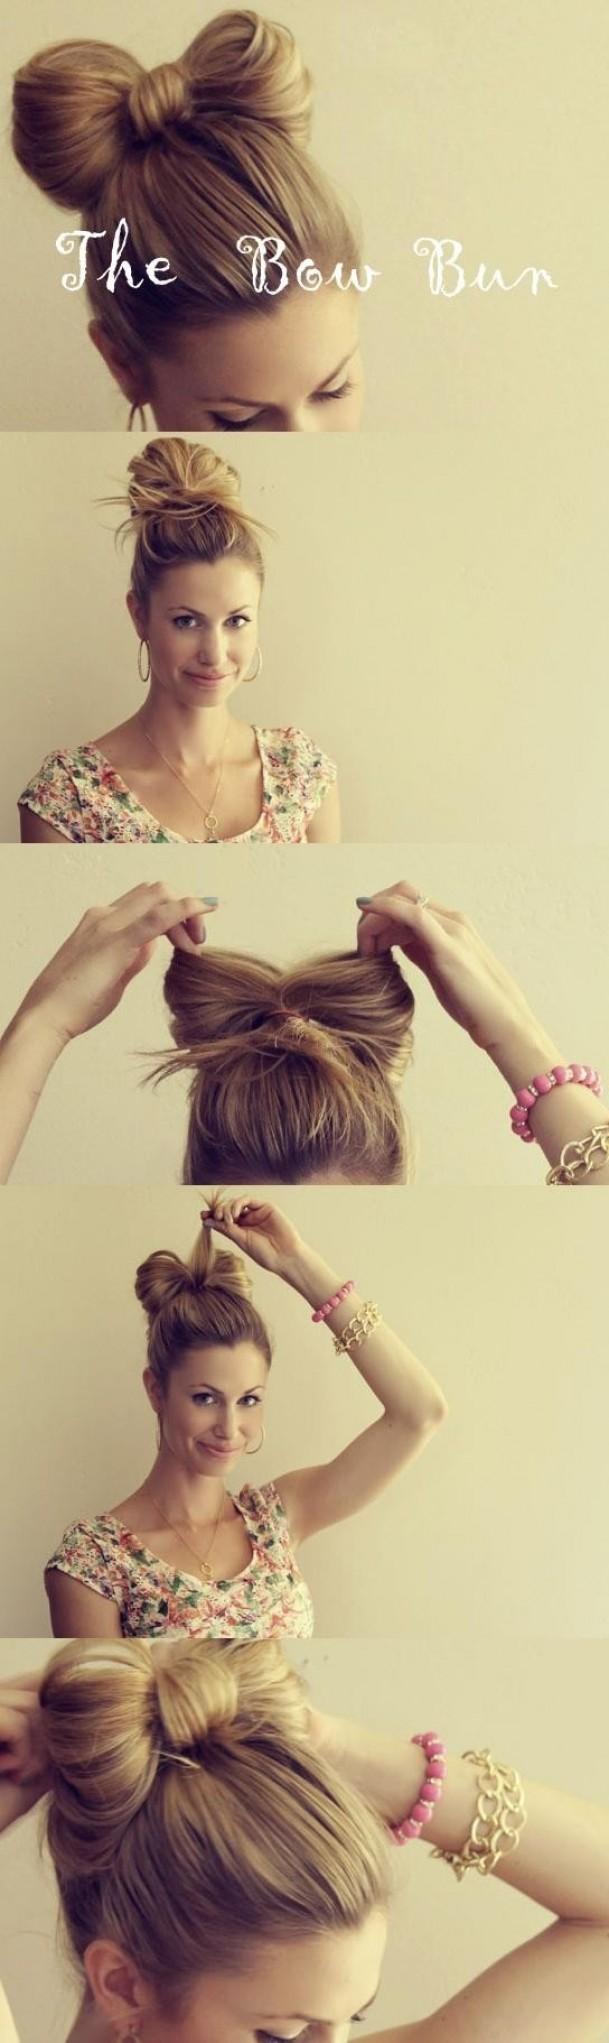 How to easily make a uhair bowu from your bun so cute hair